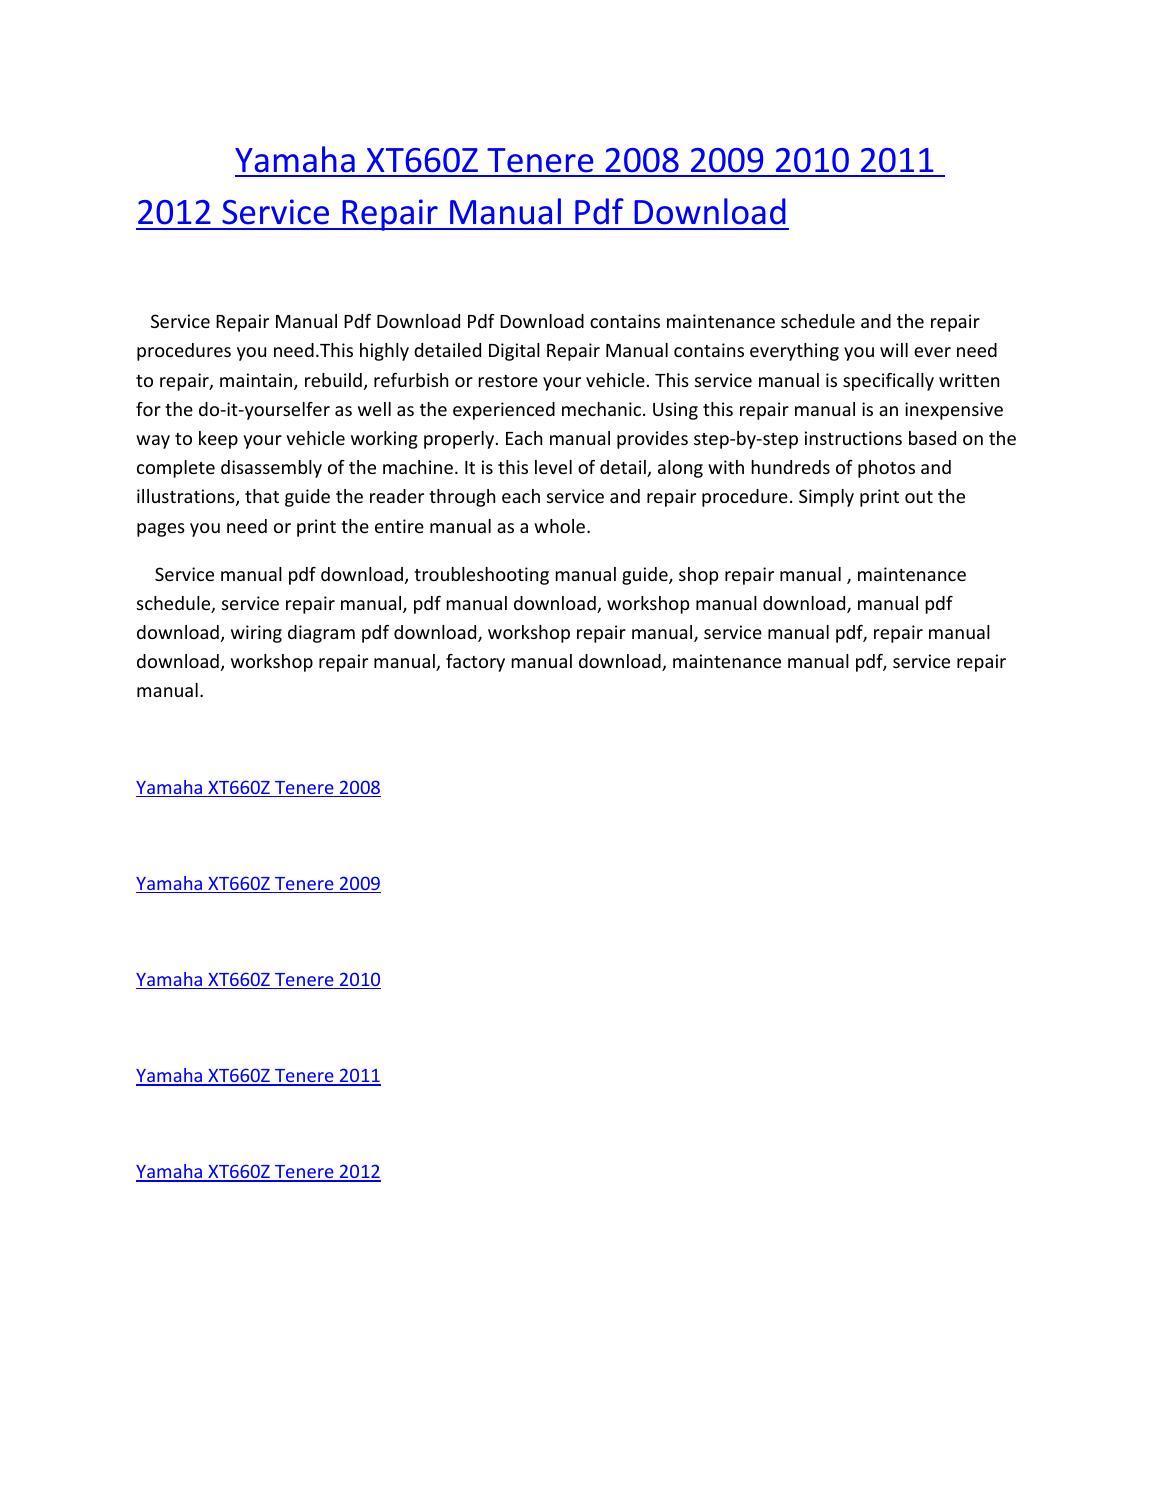 2008 Yamaha Pdf Renault Workshop Service Repair Manual Wiring Diagram 2012 Pack Array Xt660z Tenere 2009 2010 2011 Rh Issuu Com